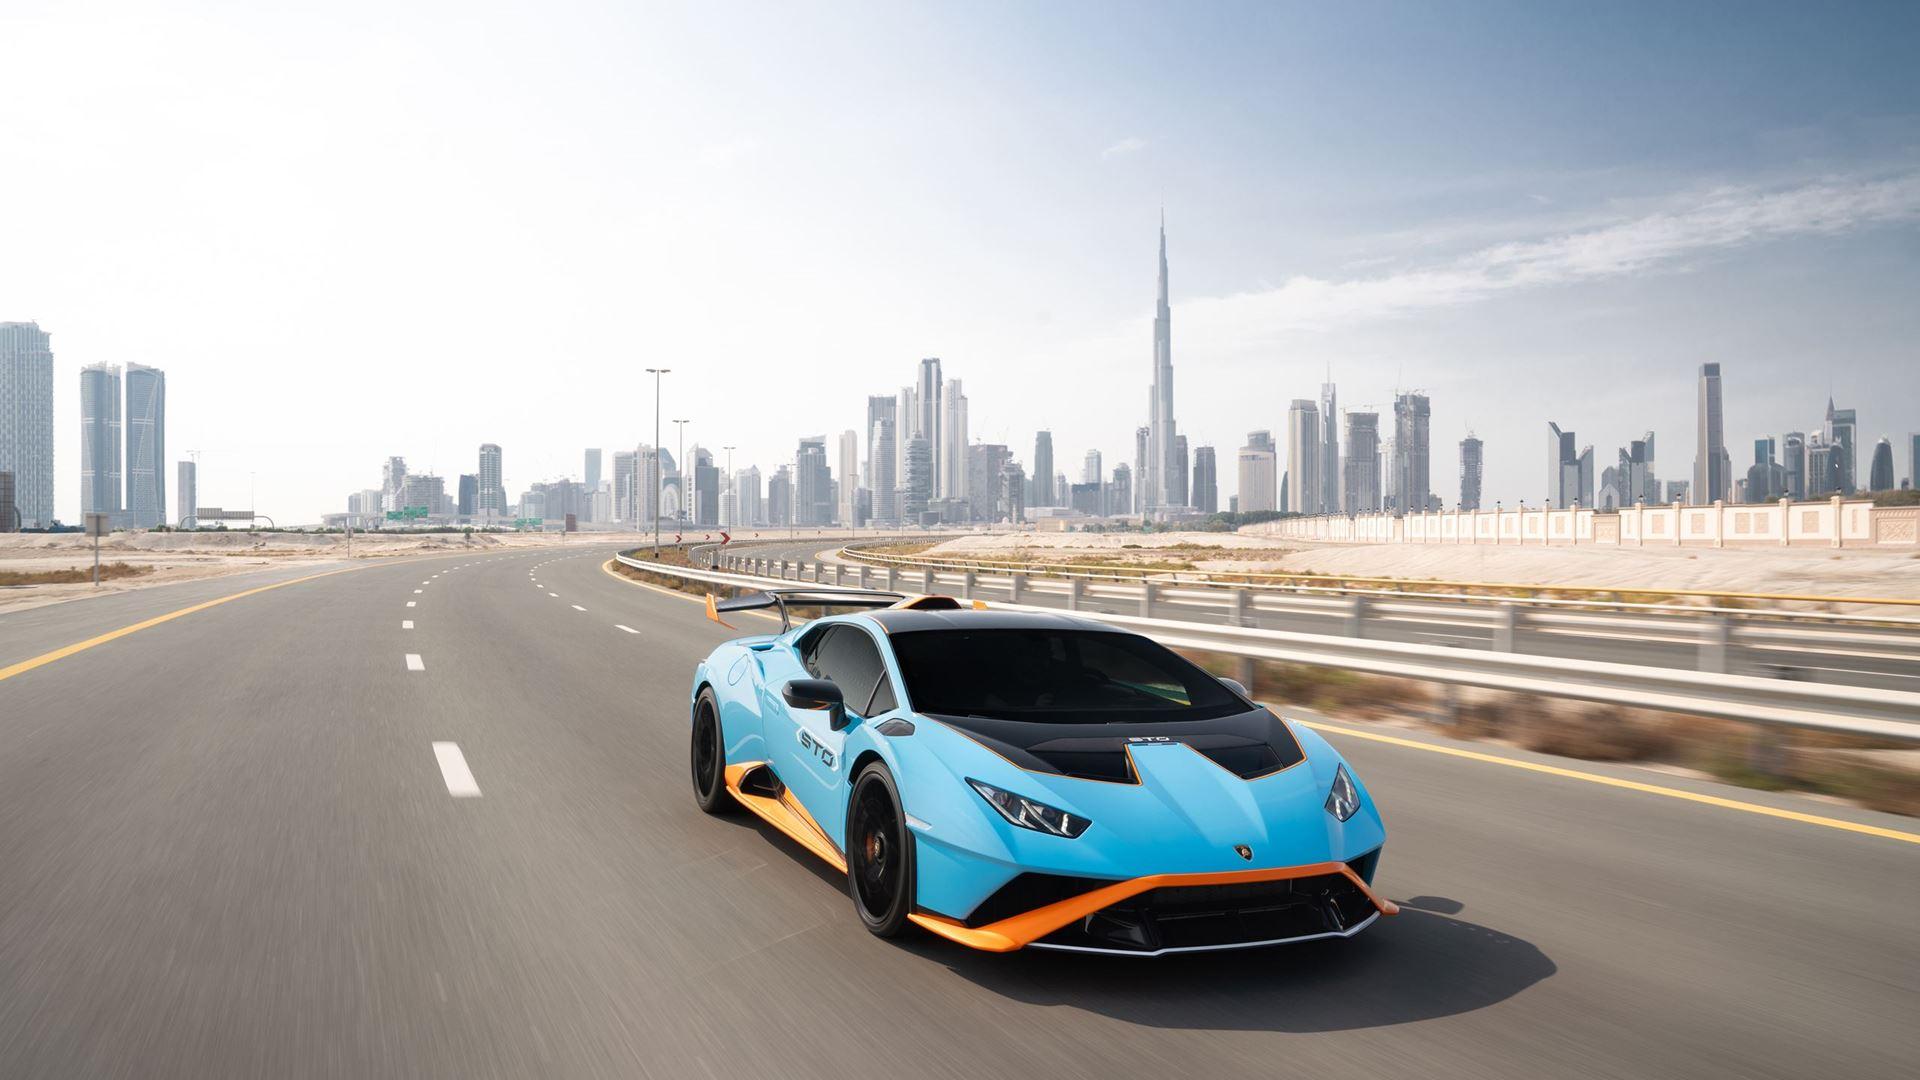 Automobili Lamborghini: sales soaring, record first quarter - Image 3